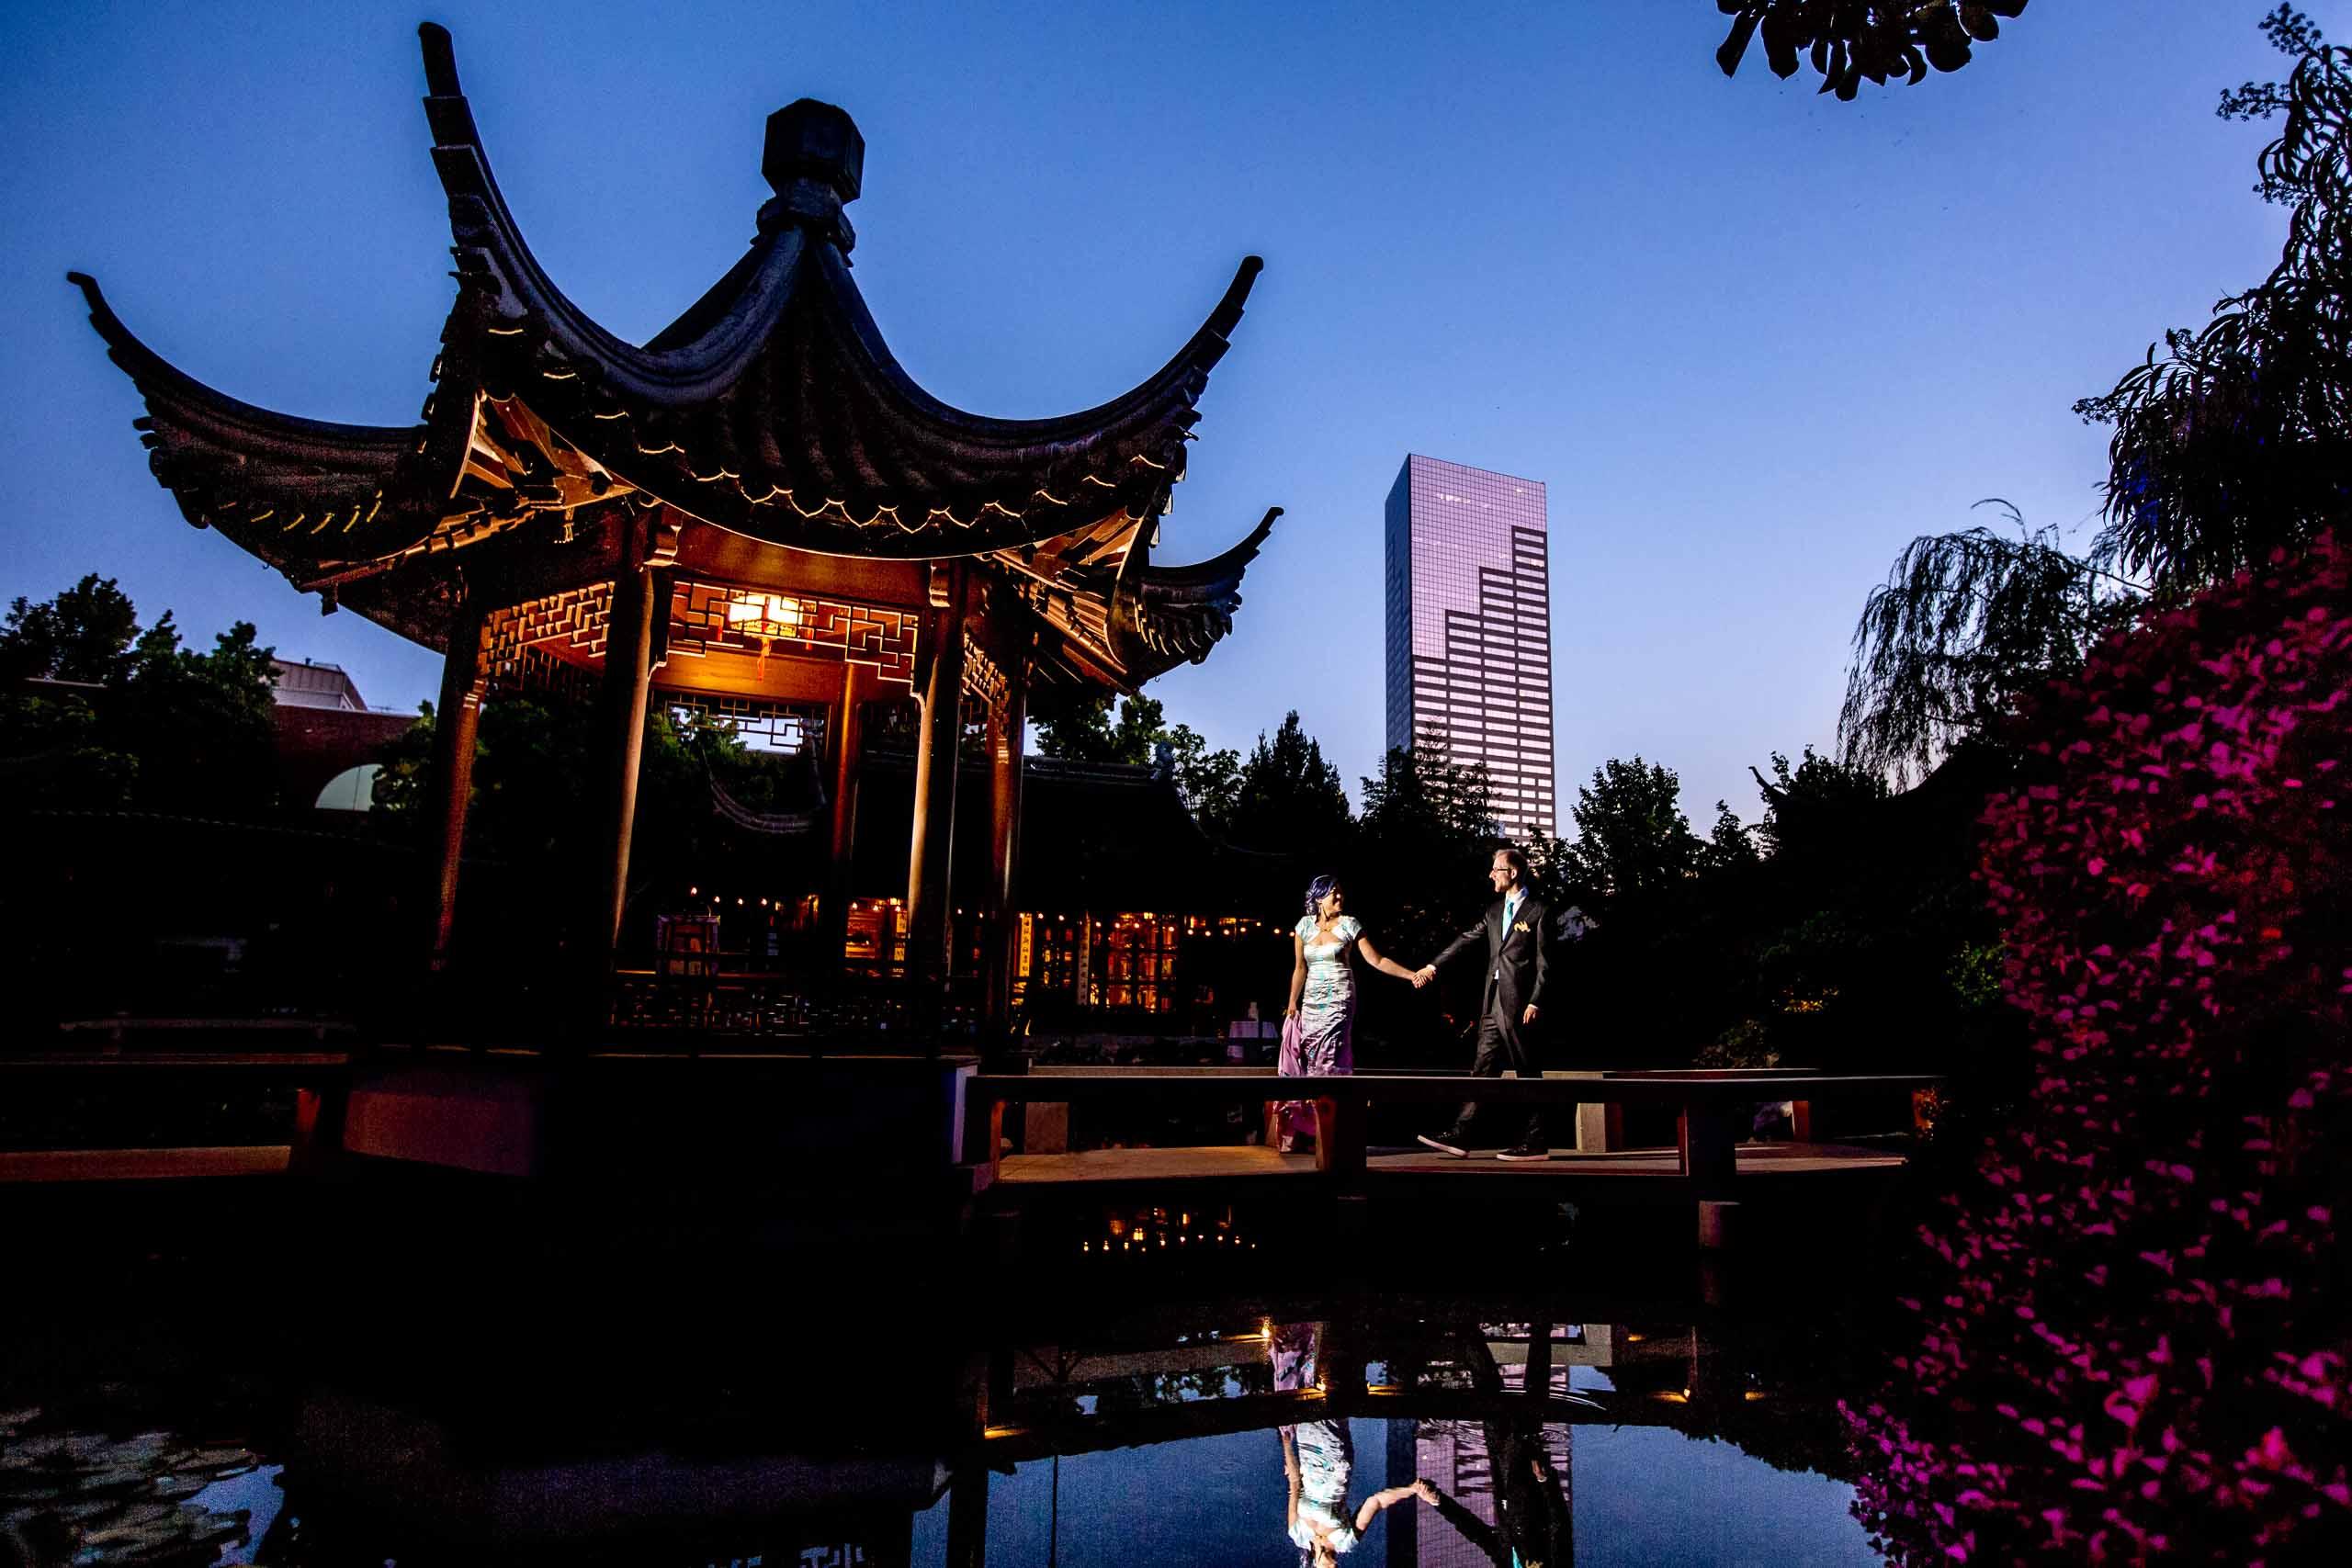 lan su chinese garden wedding jos and tree photography